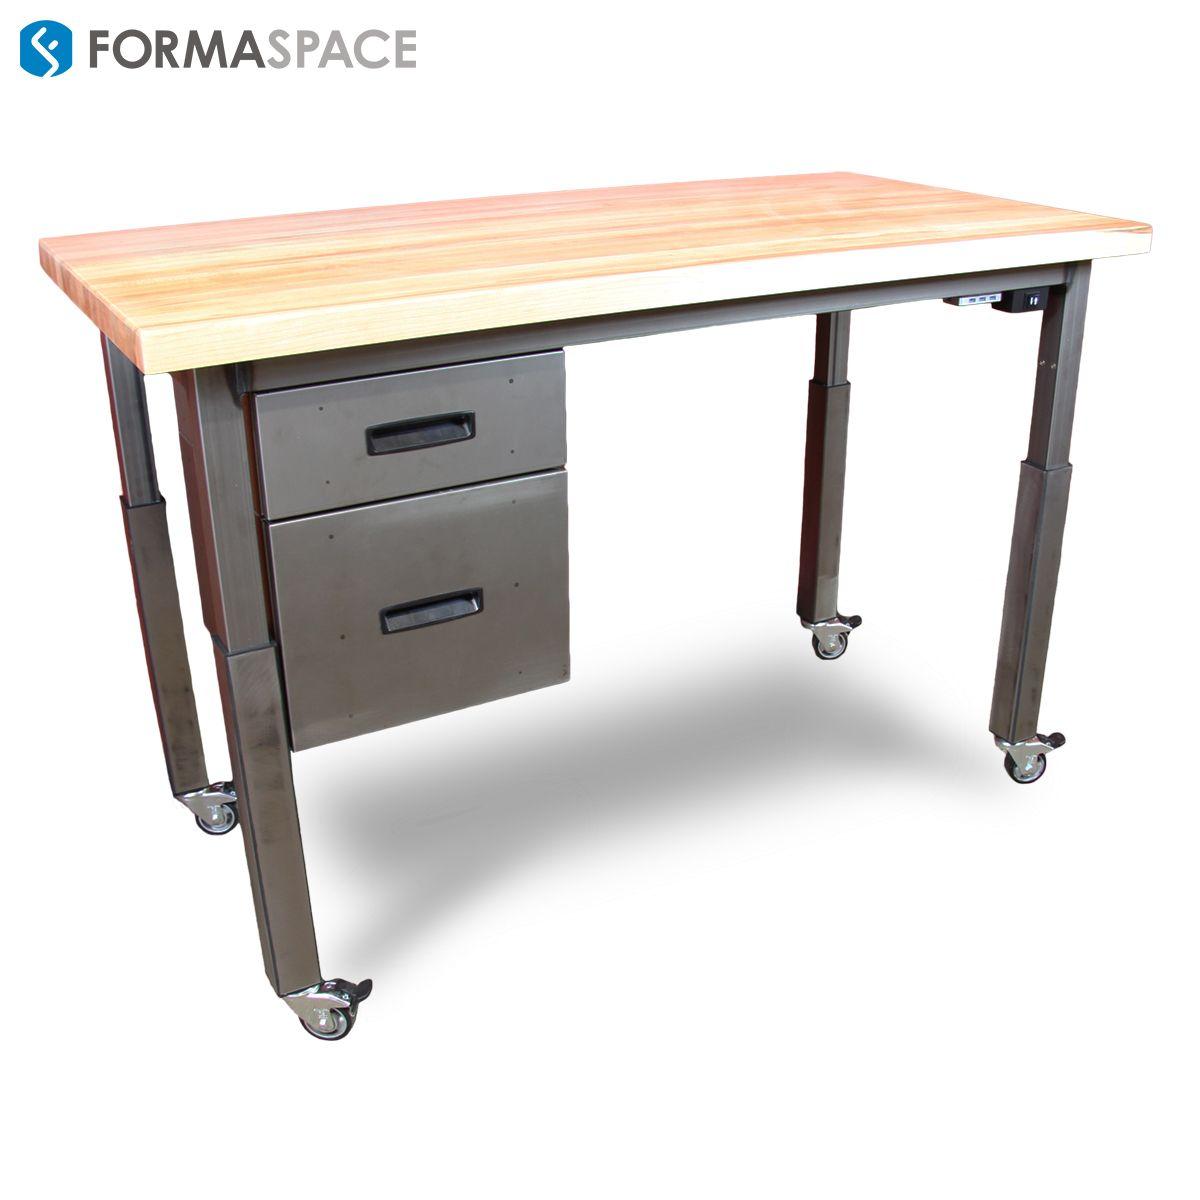 Height Adjustable Office Desk Formaspace This Height Adjustable Sit To Stand Height Adjustable Office Desk Custom Office Furniture Office Furniture Design